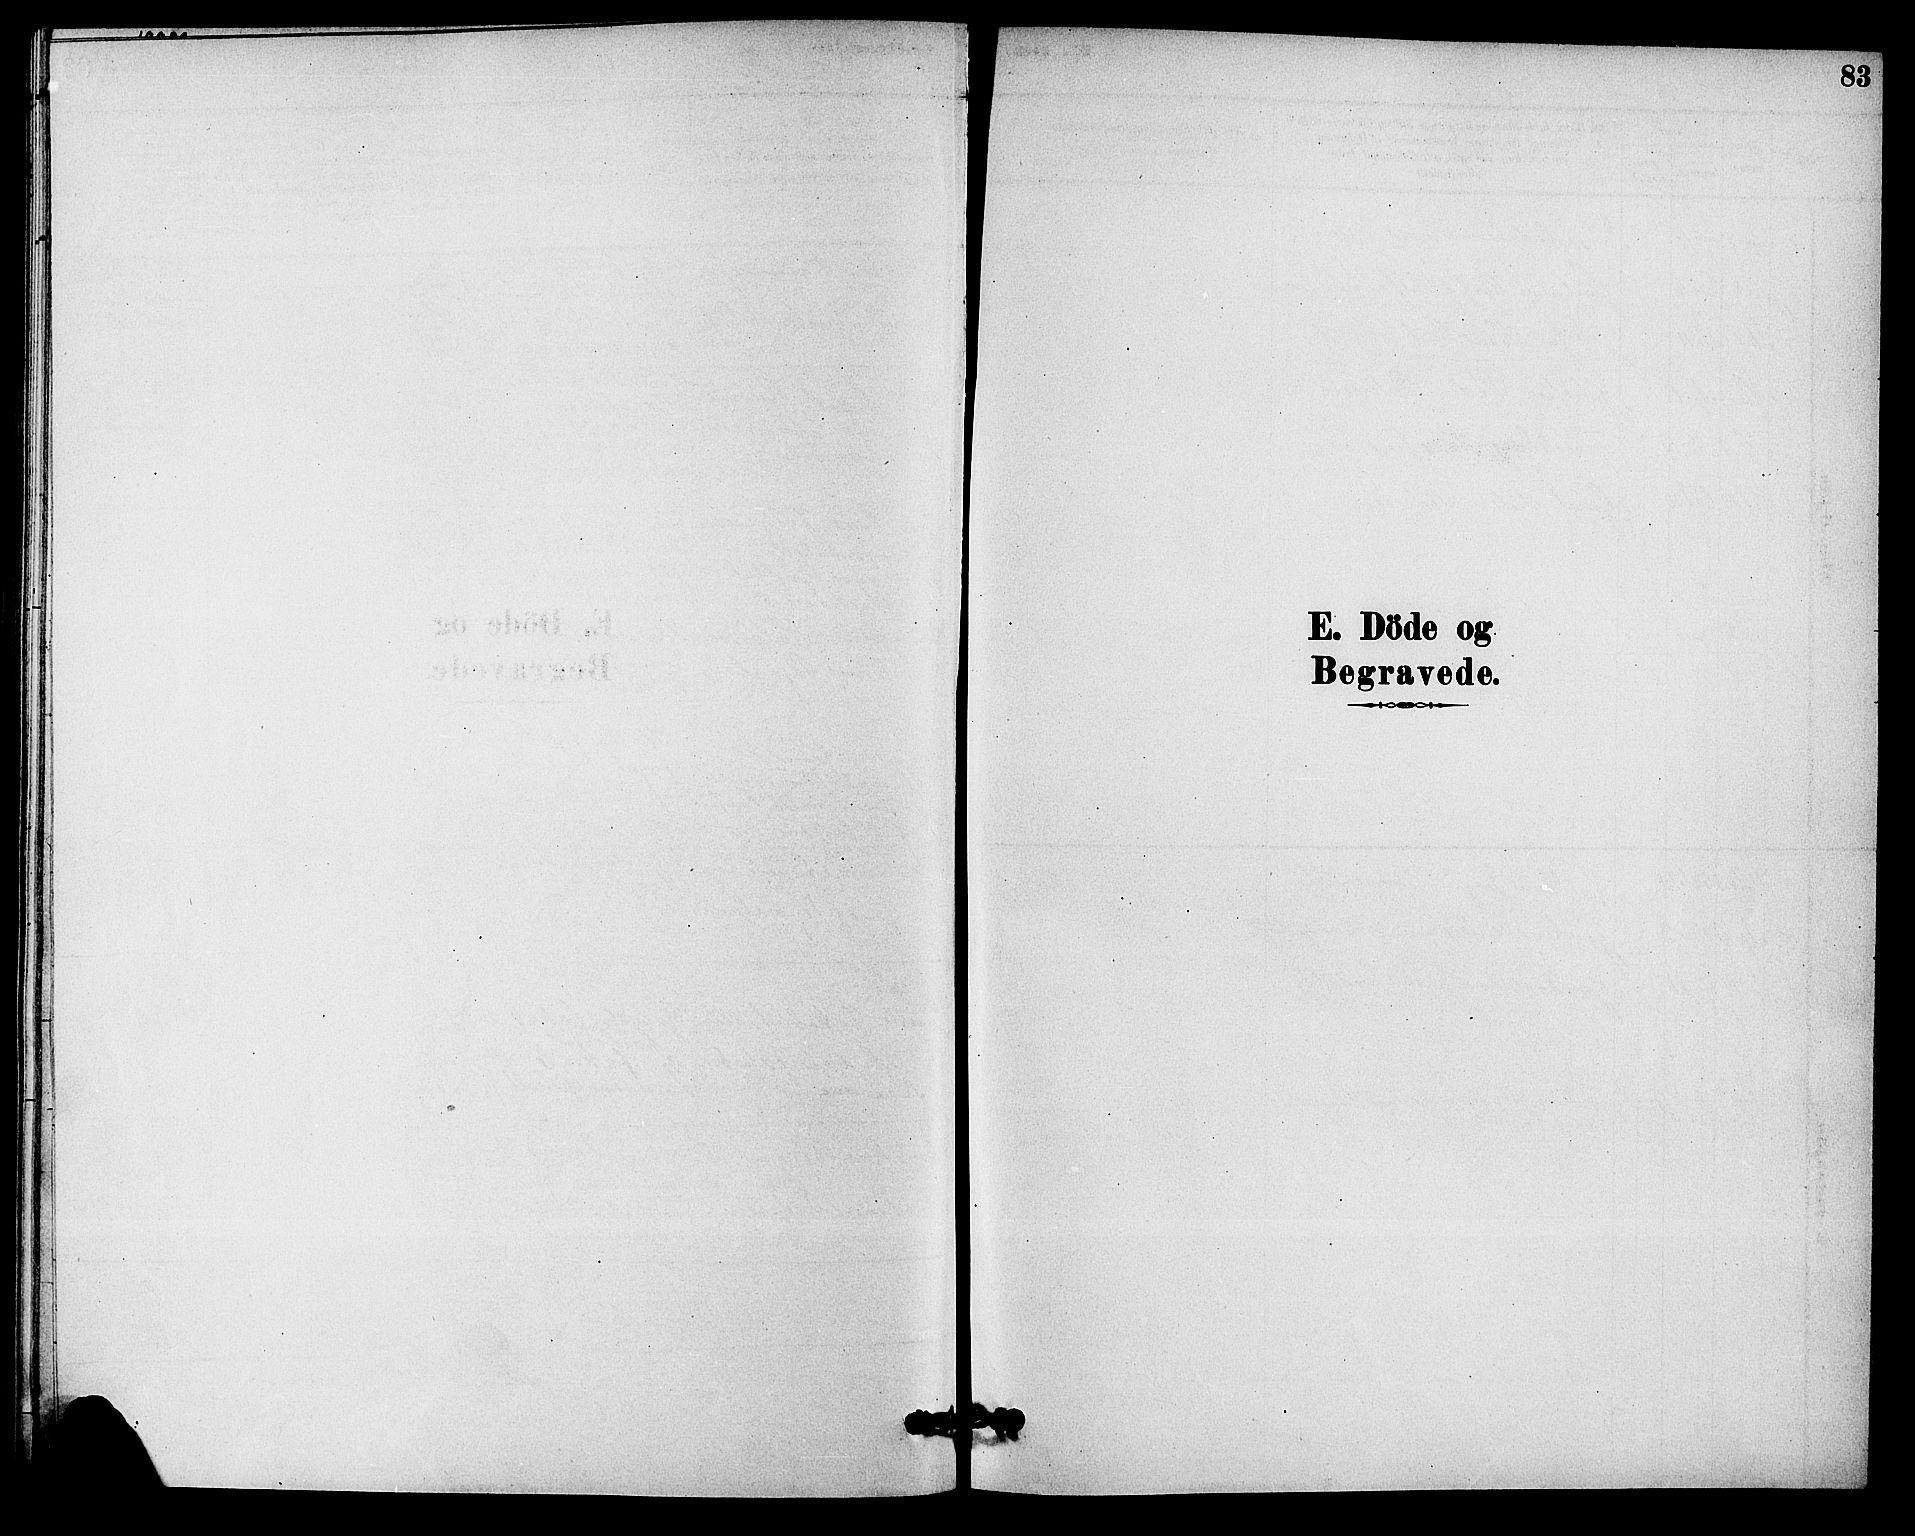 SAKO, Solum kirkebøker, F/Fc/L0001: Ministerialbok nr. III 1, 1877-1891, s. 83